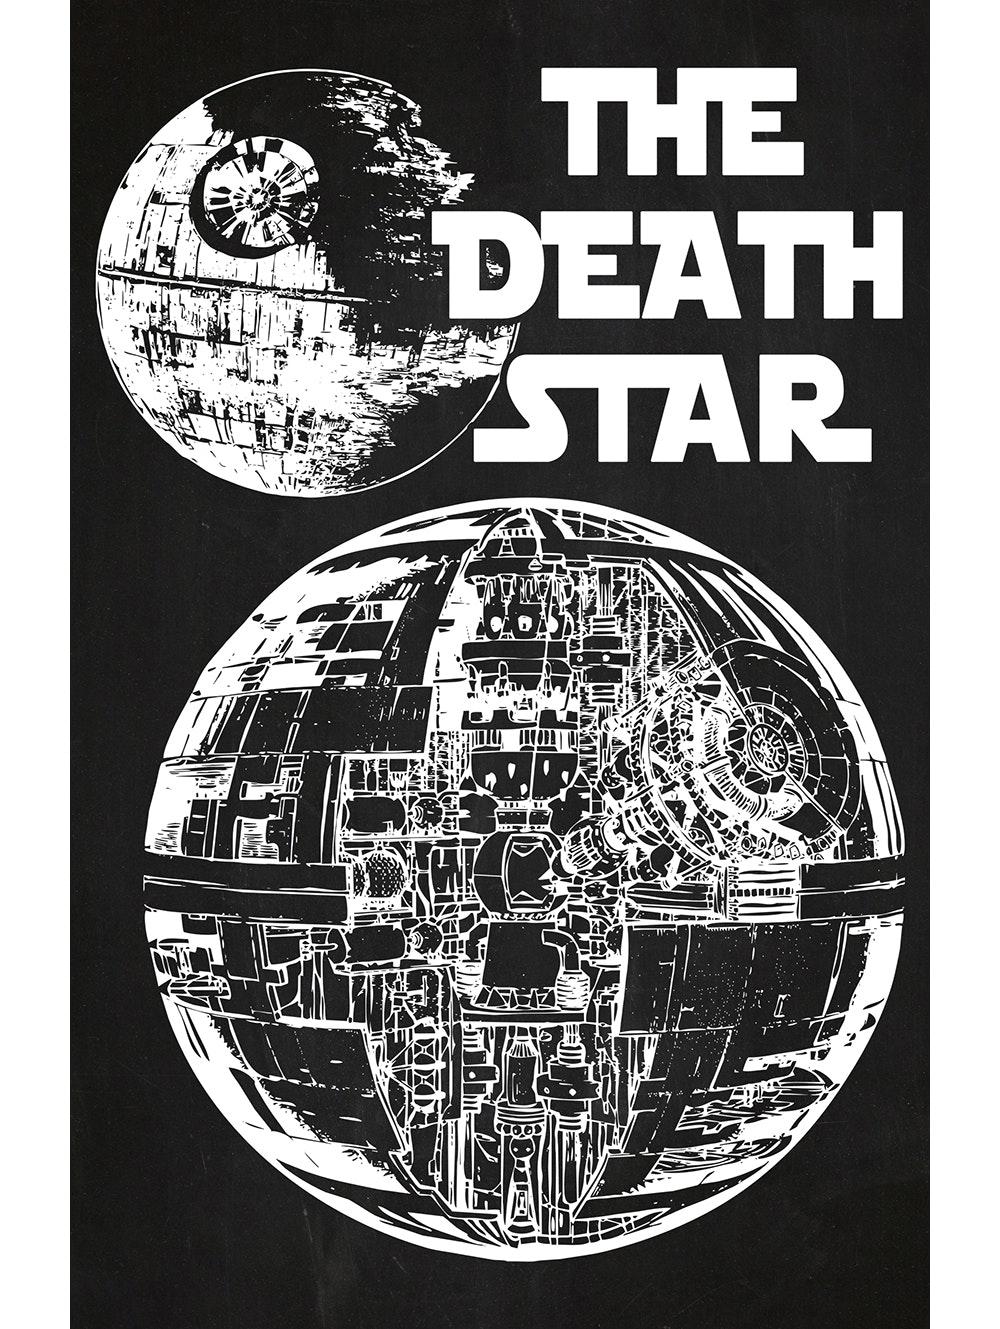 Star Wars - THE Death Star